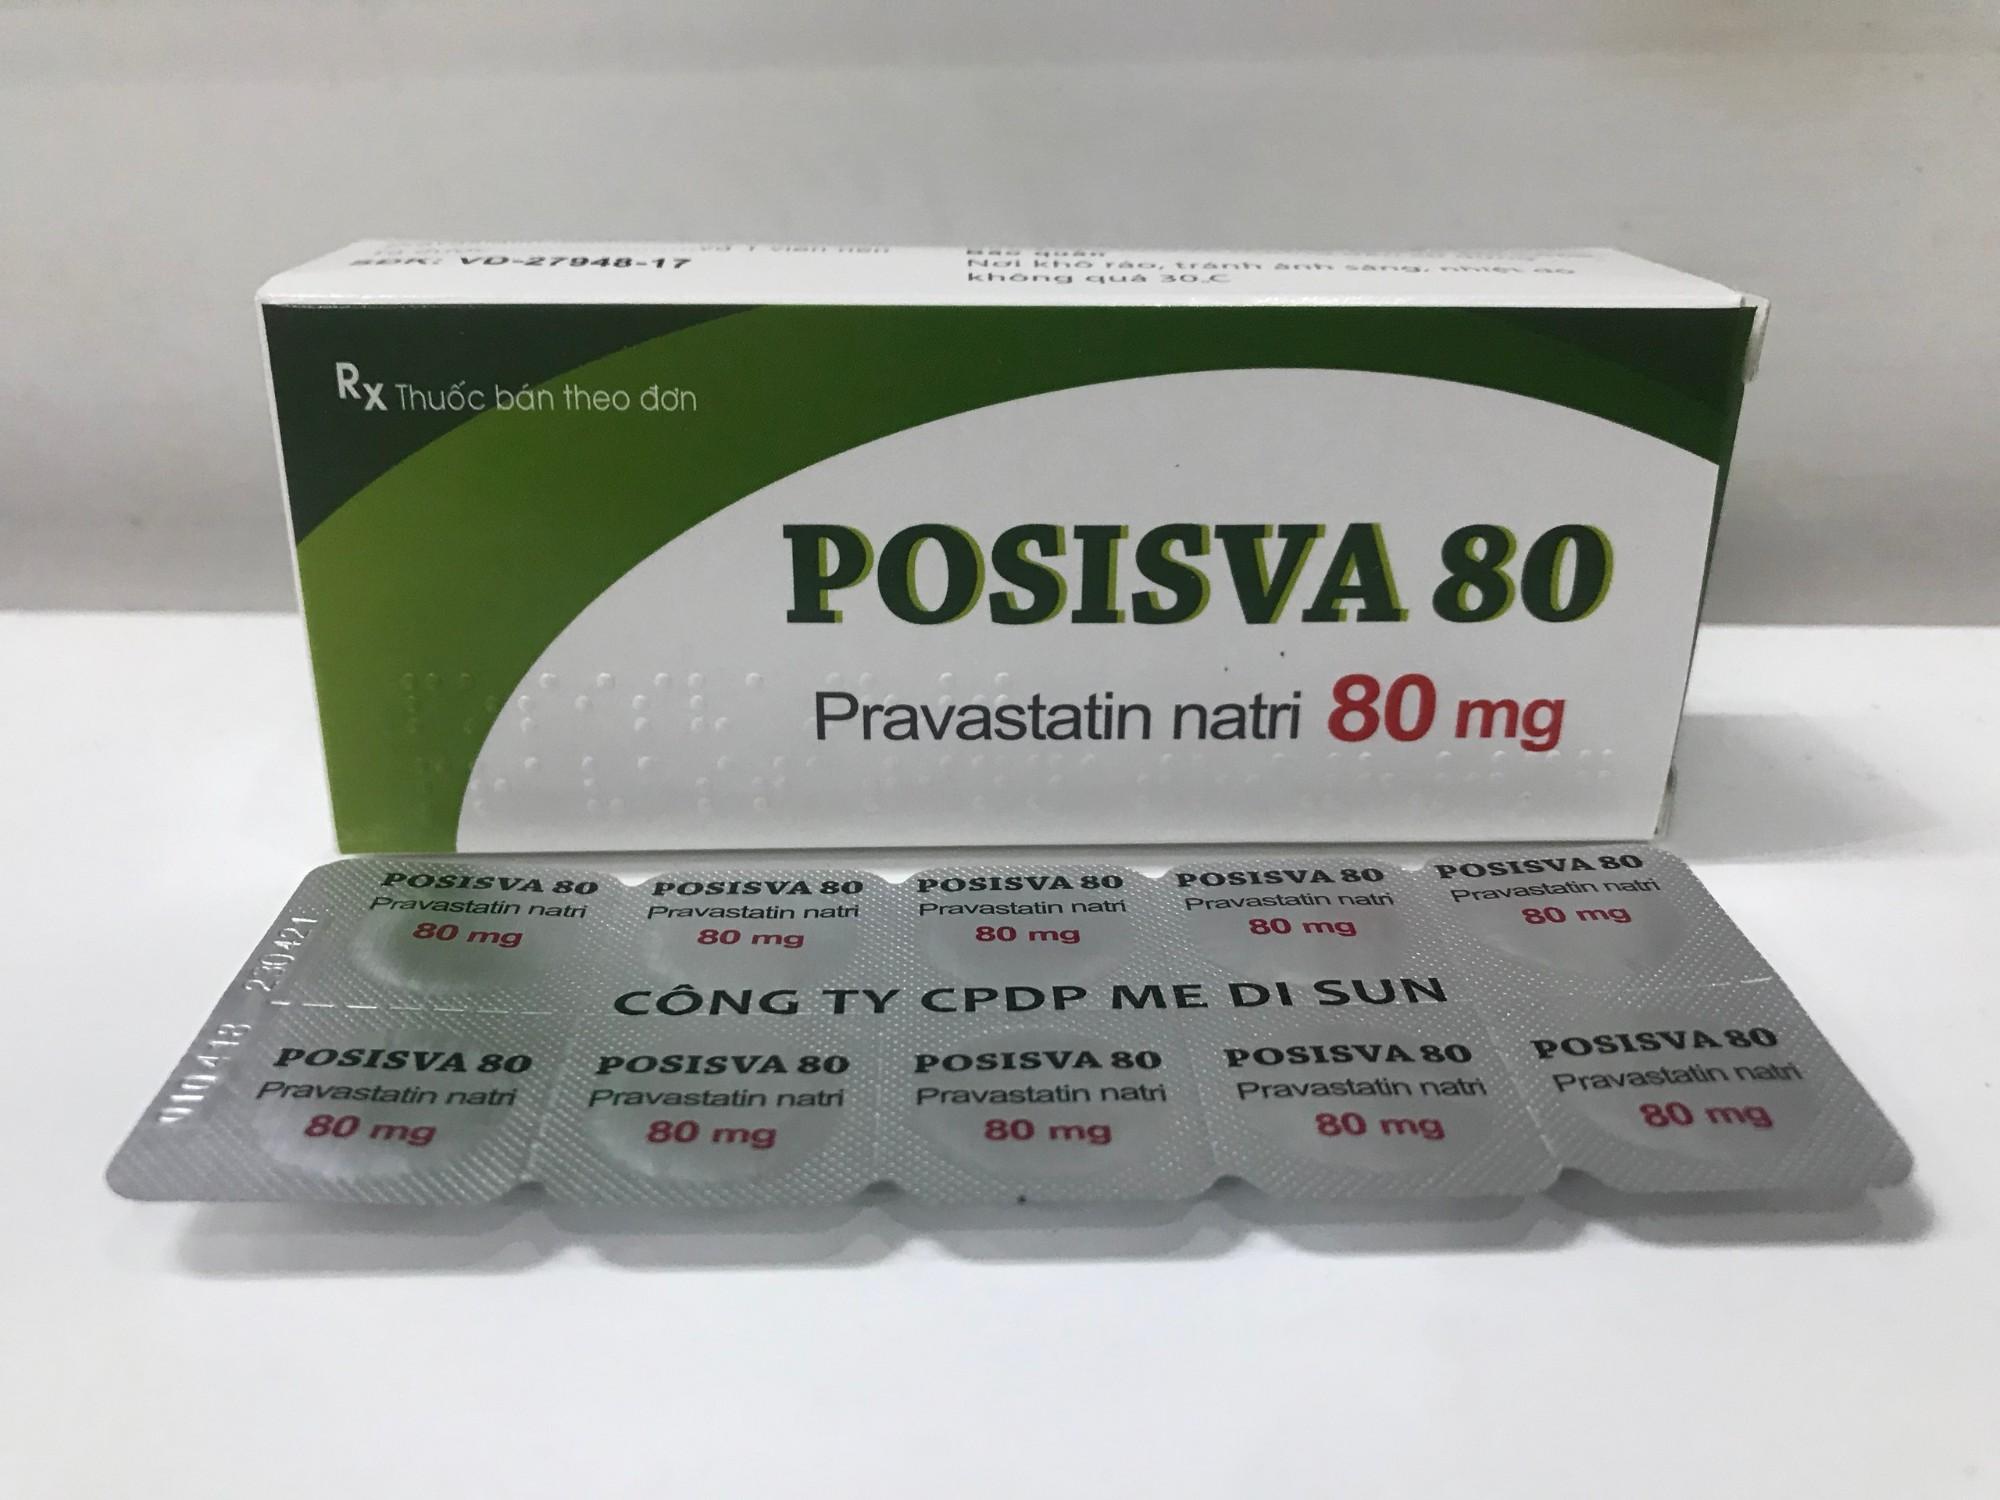 POSISVA 80 (Pravastatin 80mg)